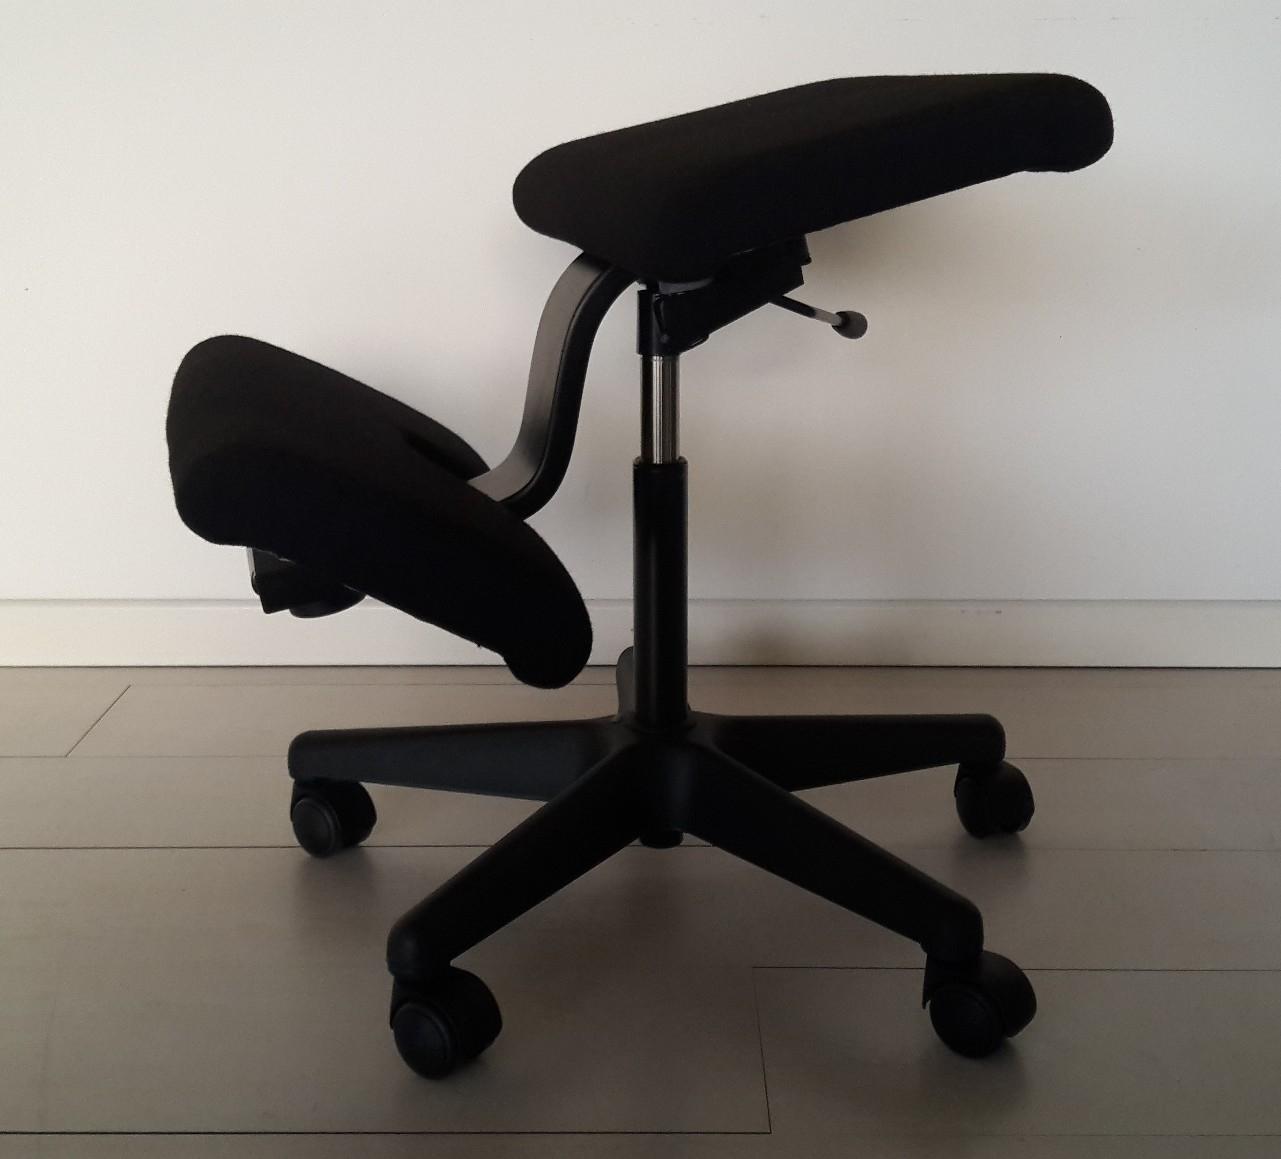 Sedia ergonomica variable varier sedia stokke variable for Sedia ufficio ginocchia